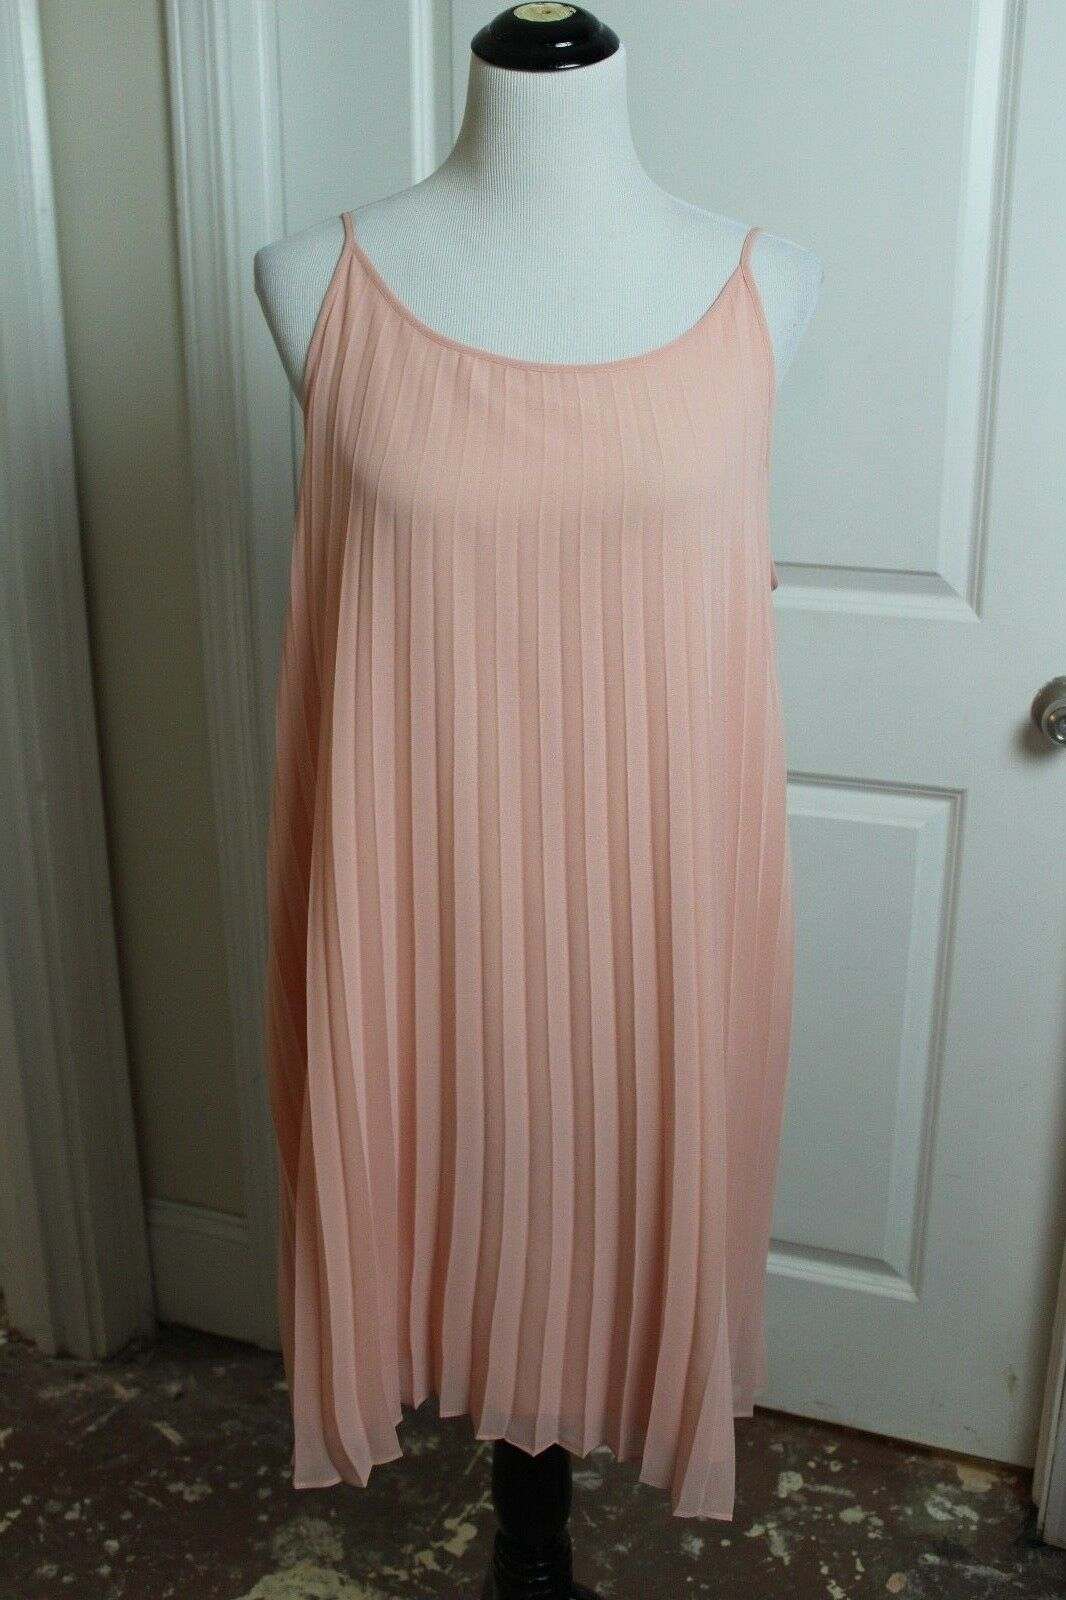 BCBGeneration Womens Sunburst Accordion Pleated Dress in Coral pink SZ L